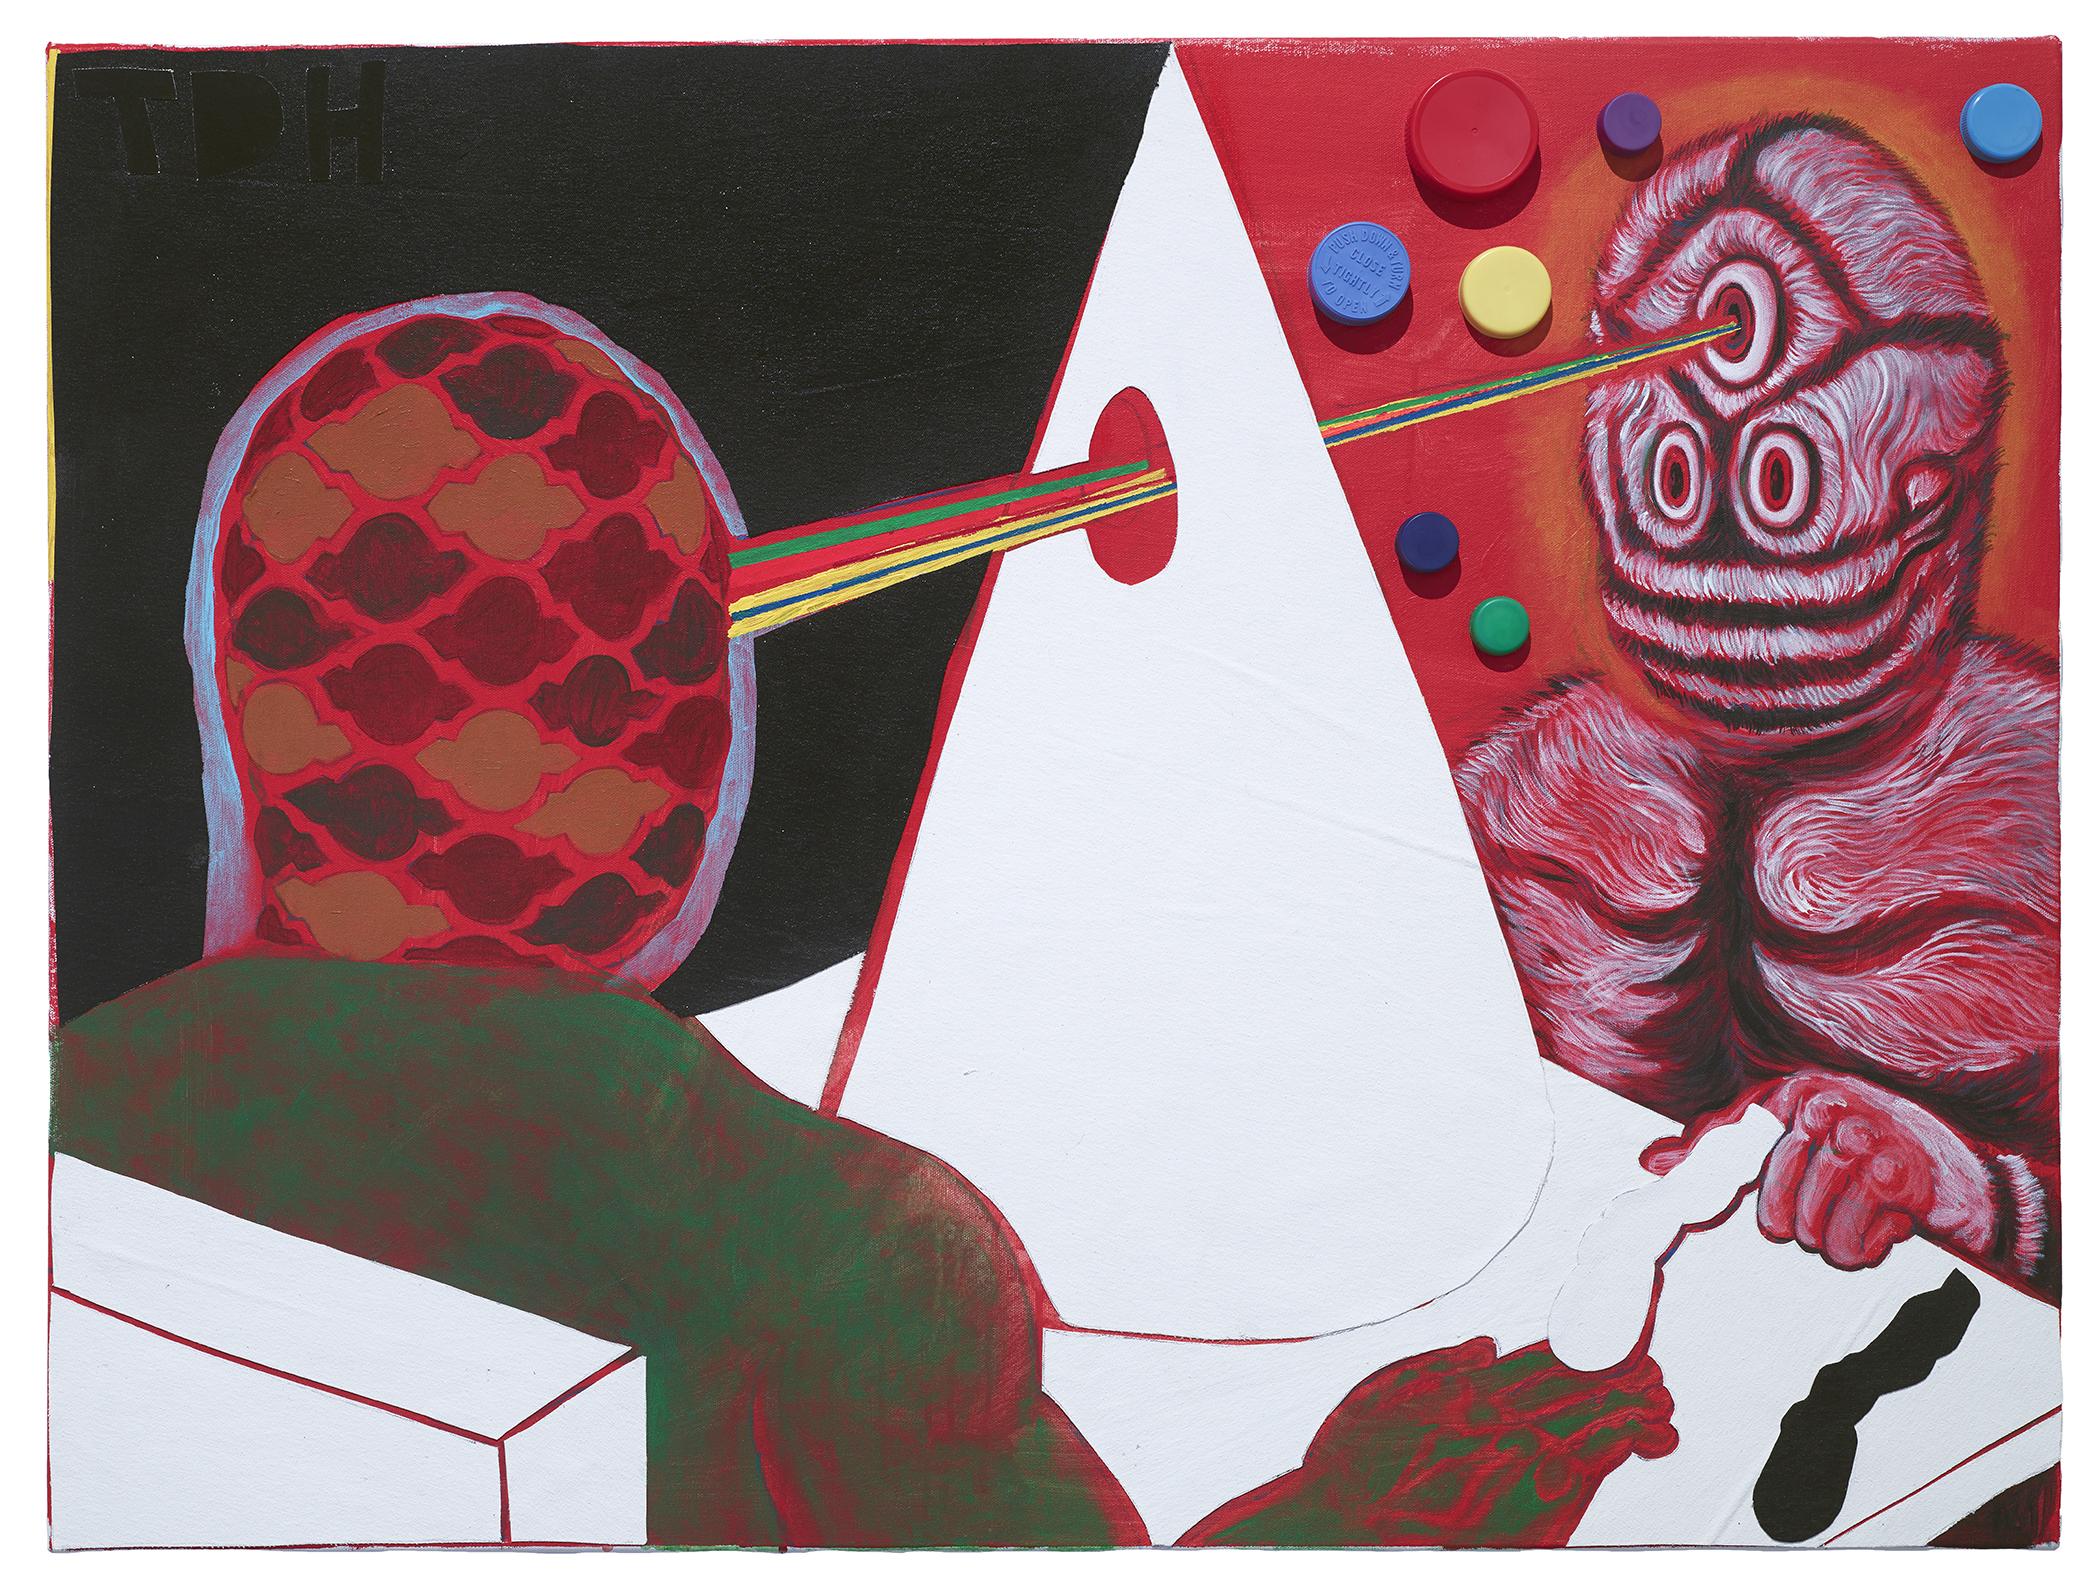 Trenton Doyle Hancock, Knowledge From Samantha, 2015, acrylic and mixed media on canvas, 30 x 42 inches